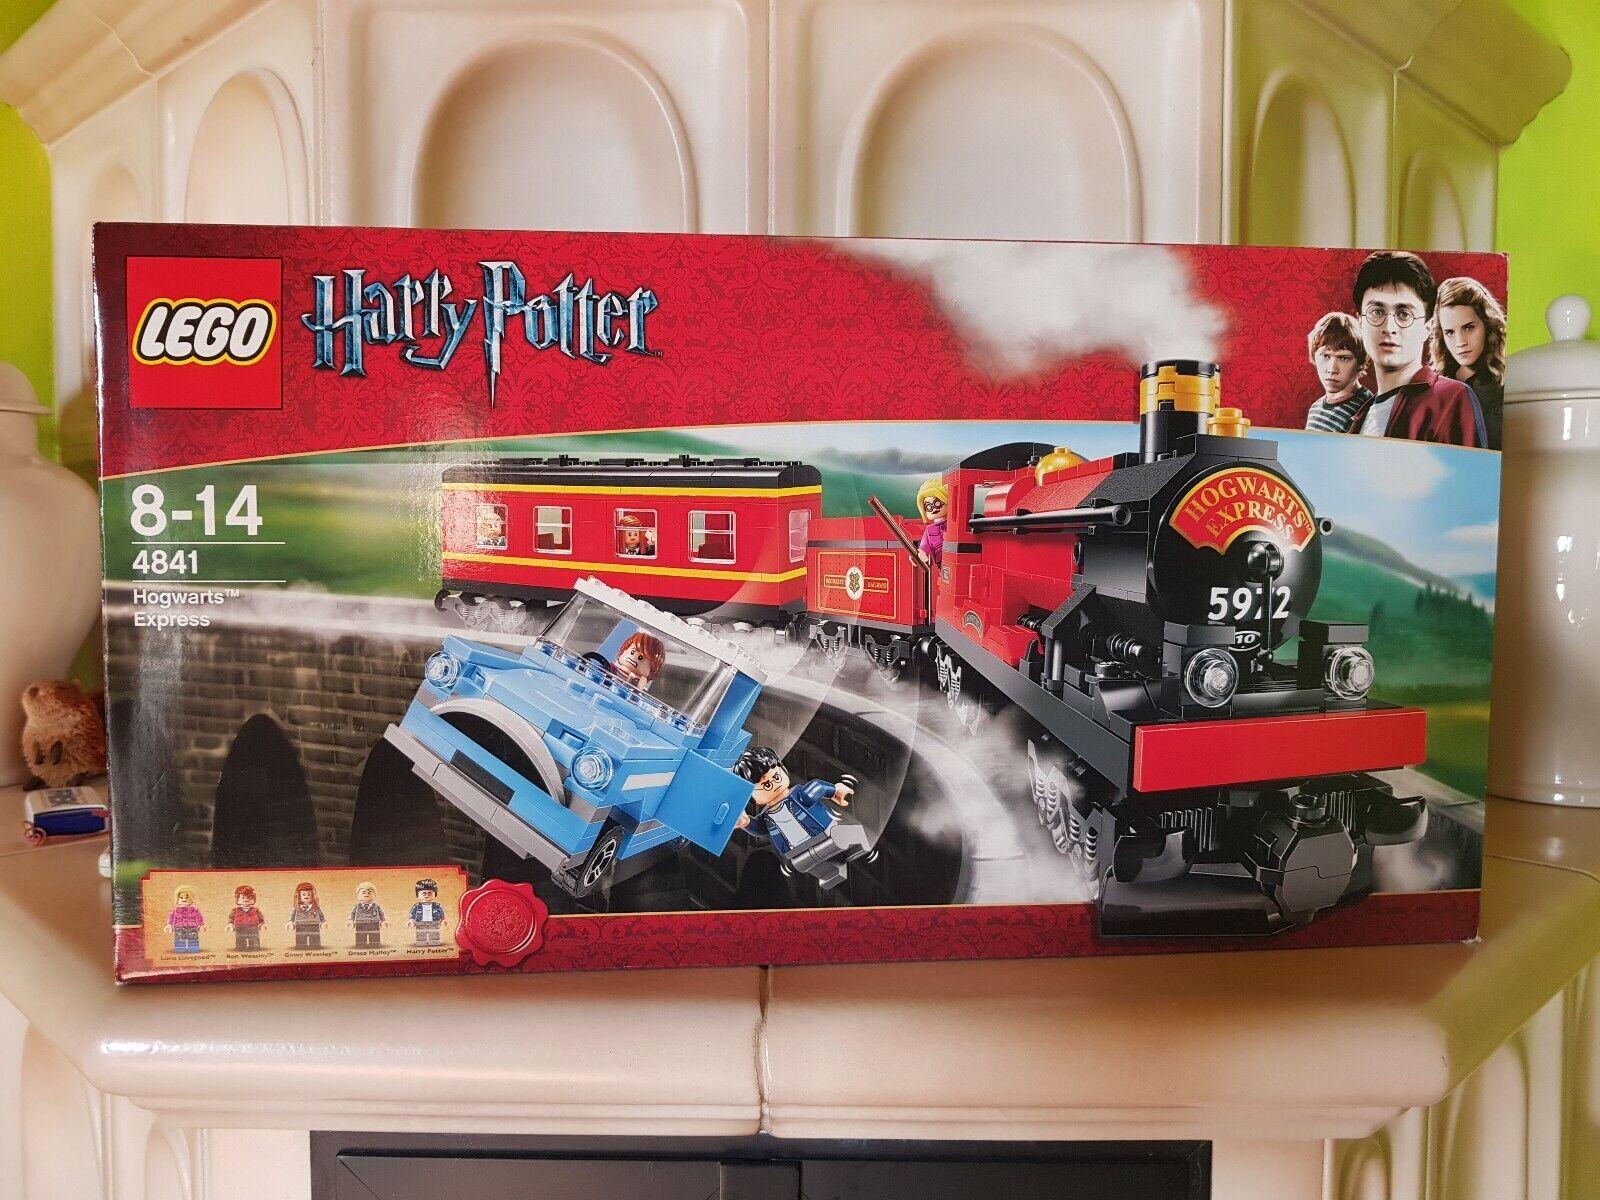 LEGO Harry Potter 4841 treno Hogwarts Express  NUOvo   Raro perfetto introvabile